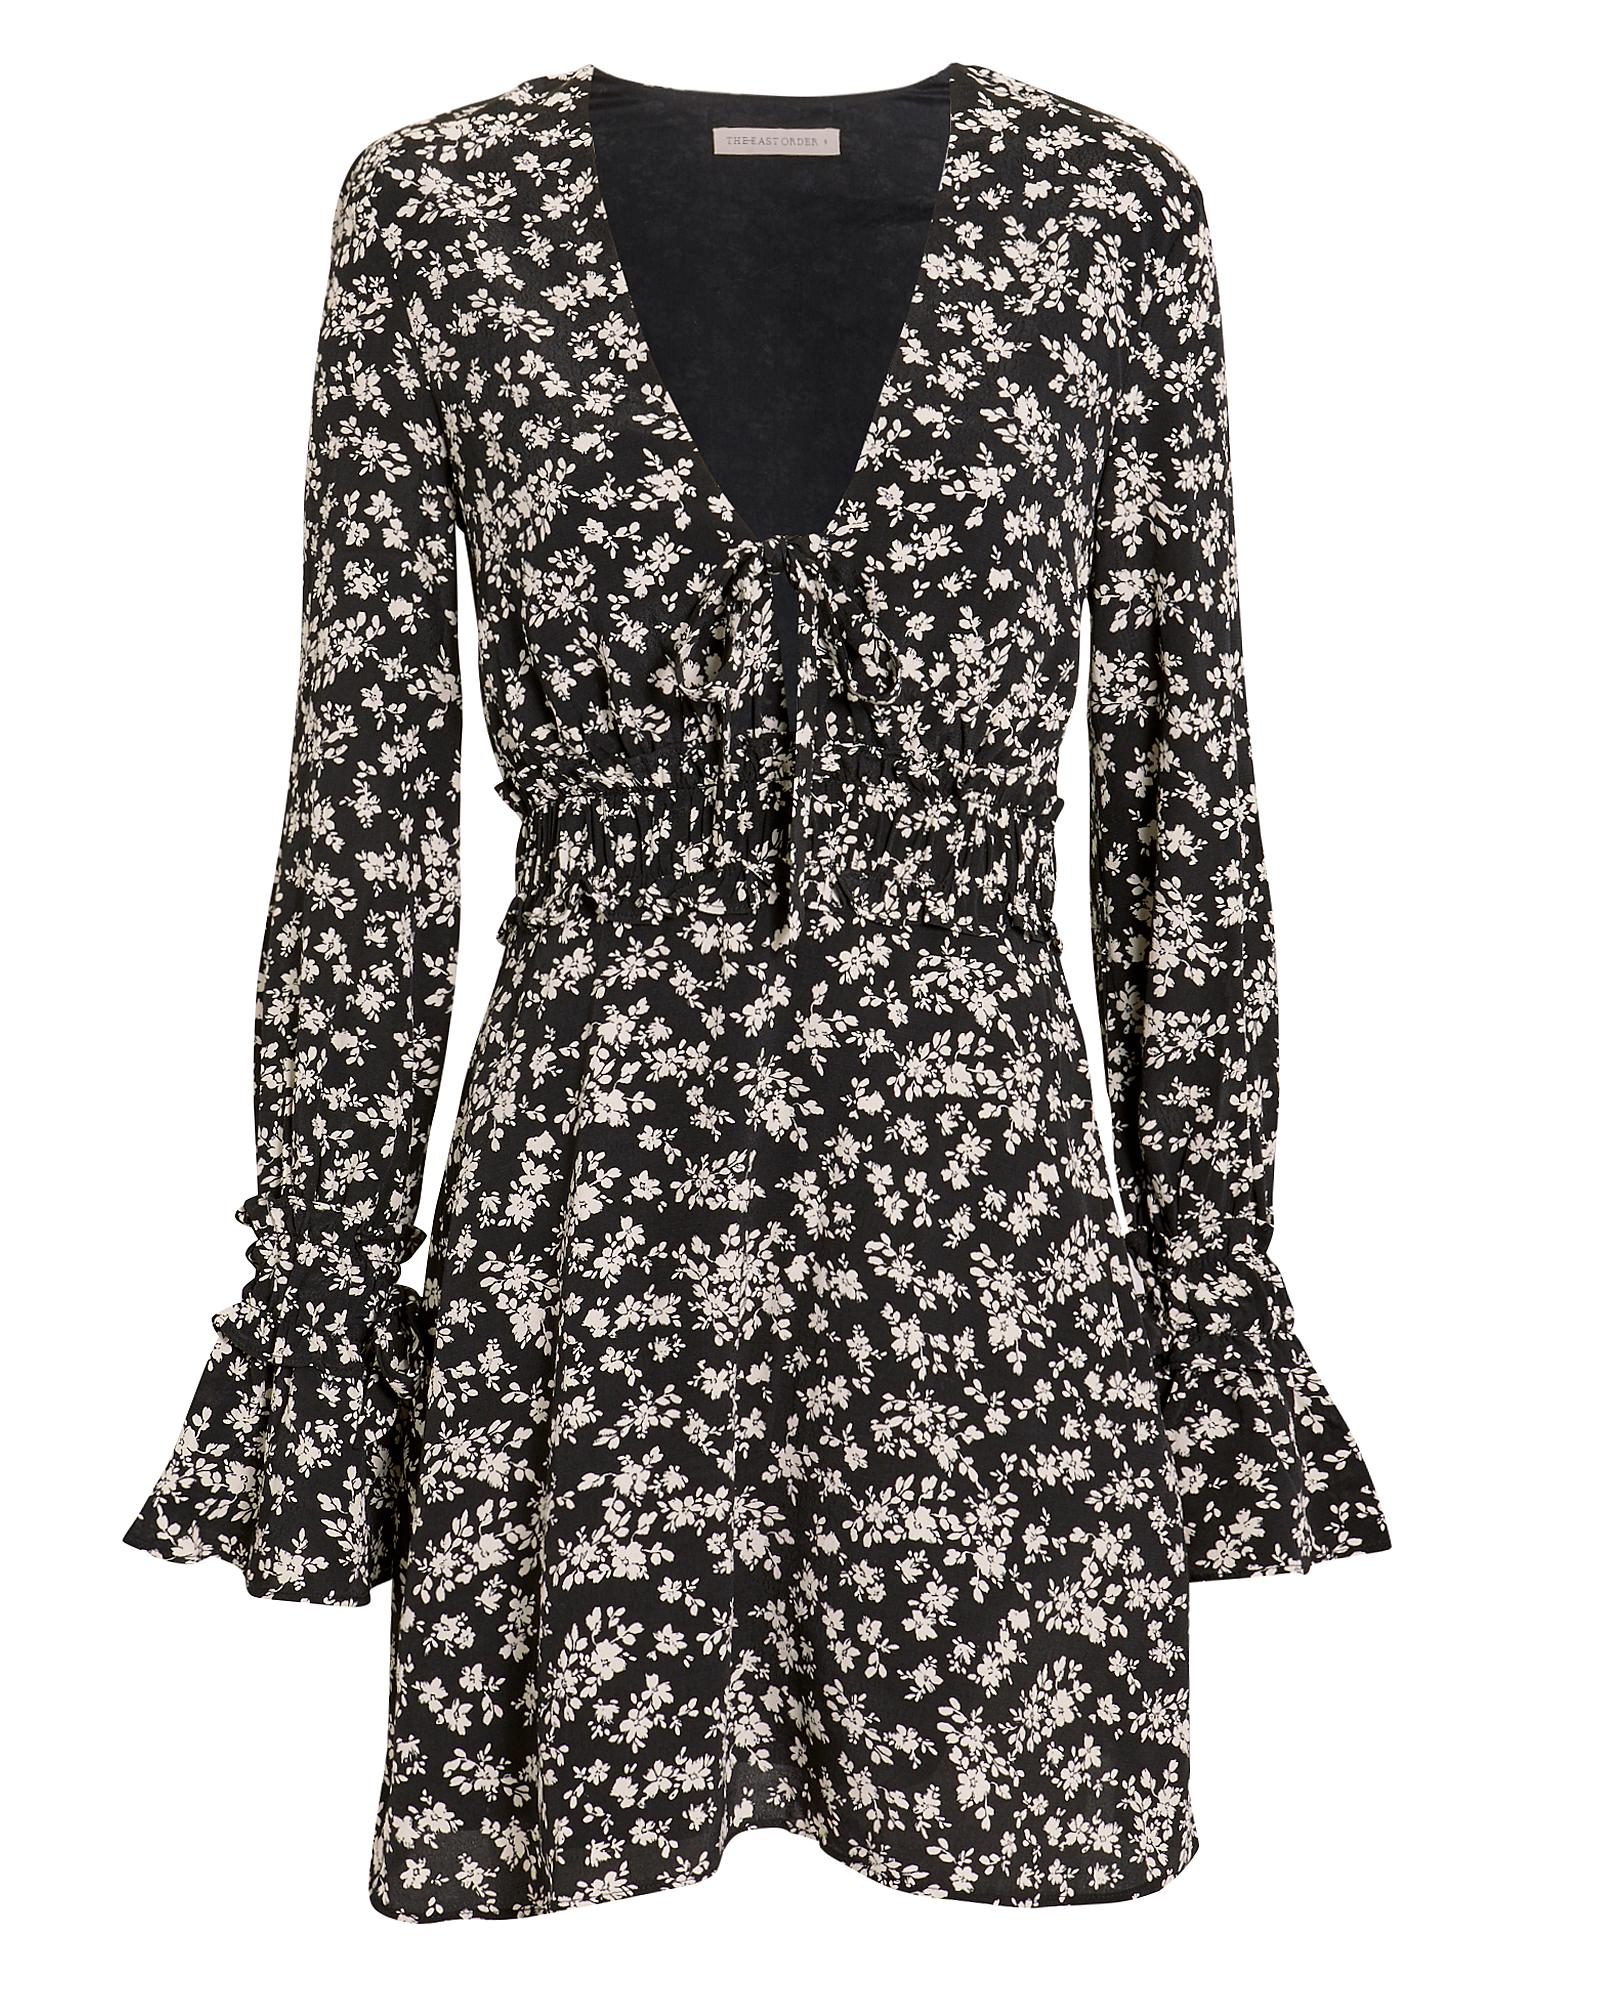 Elsa Floral-Print Mini Dress in Black/White